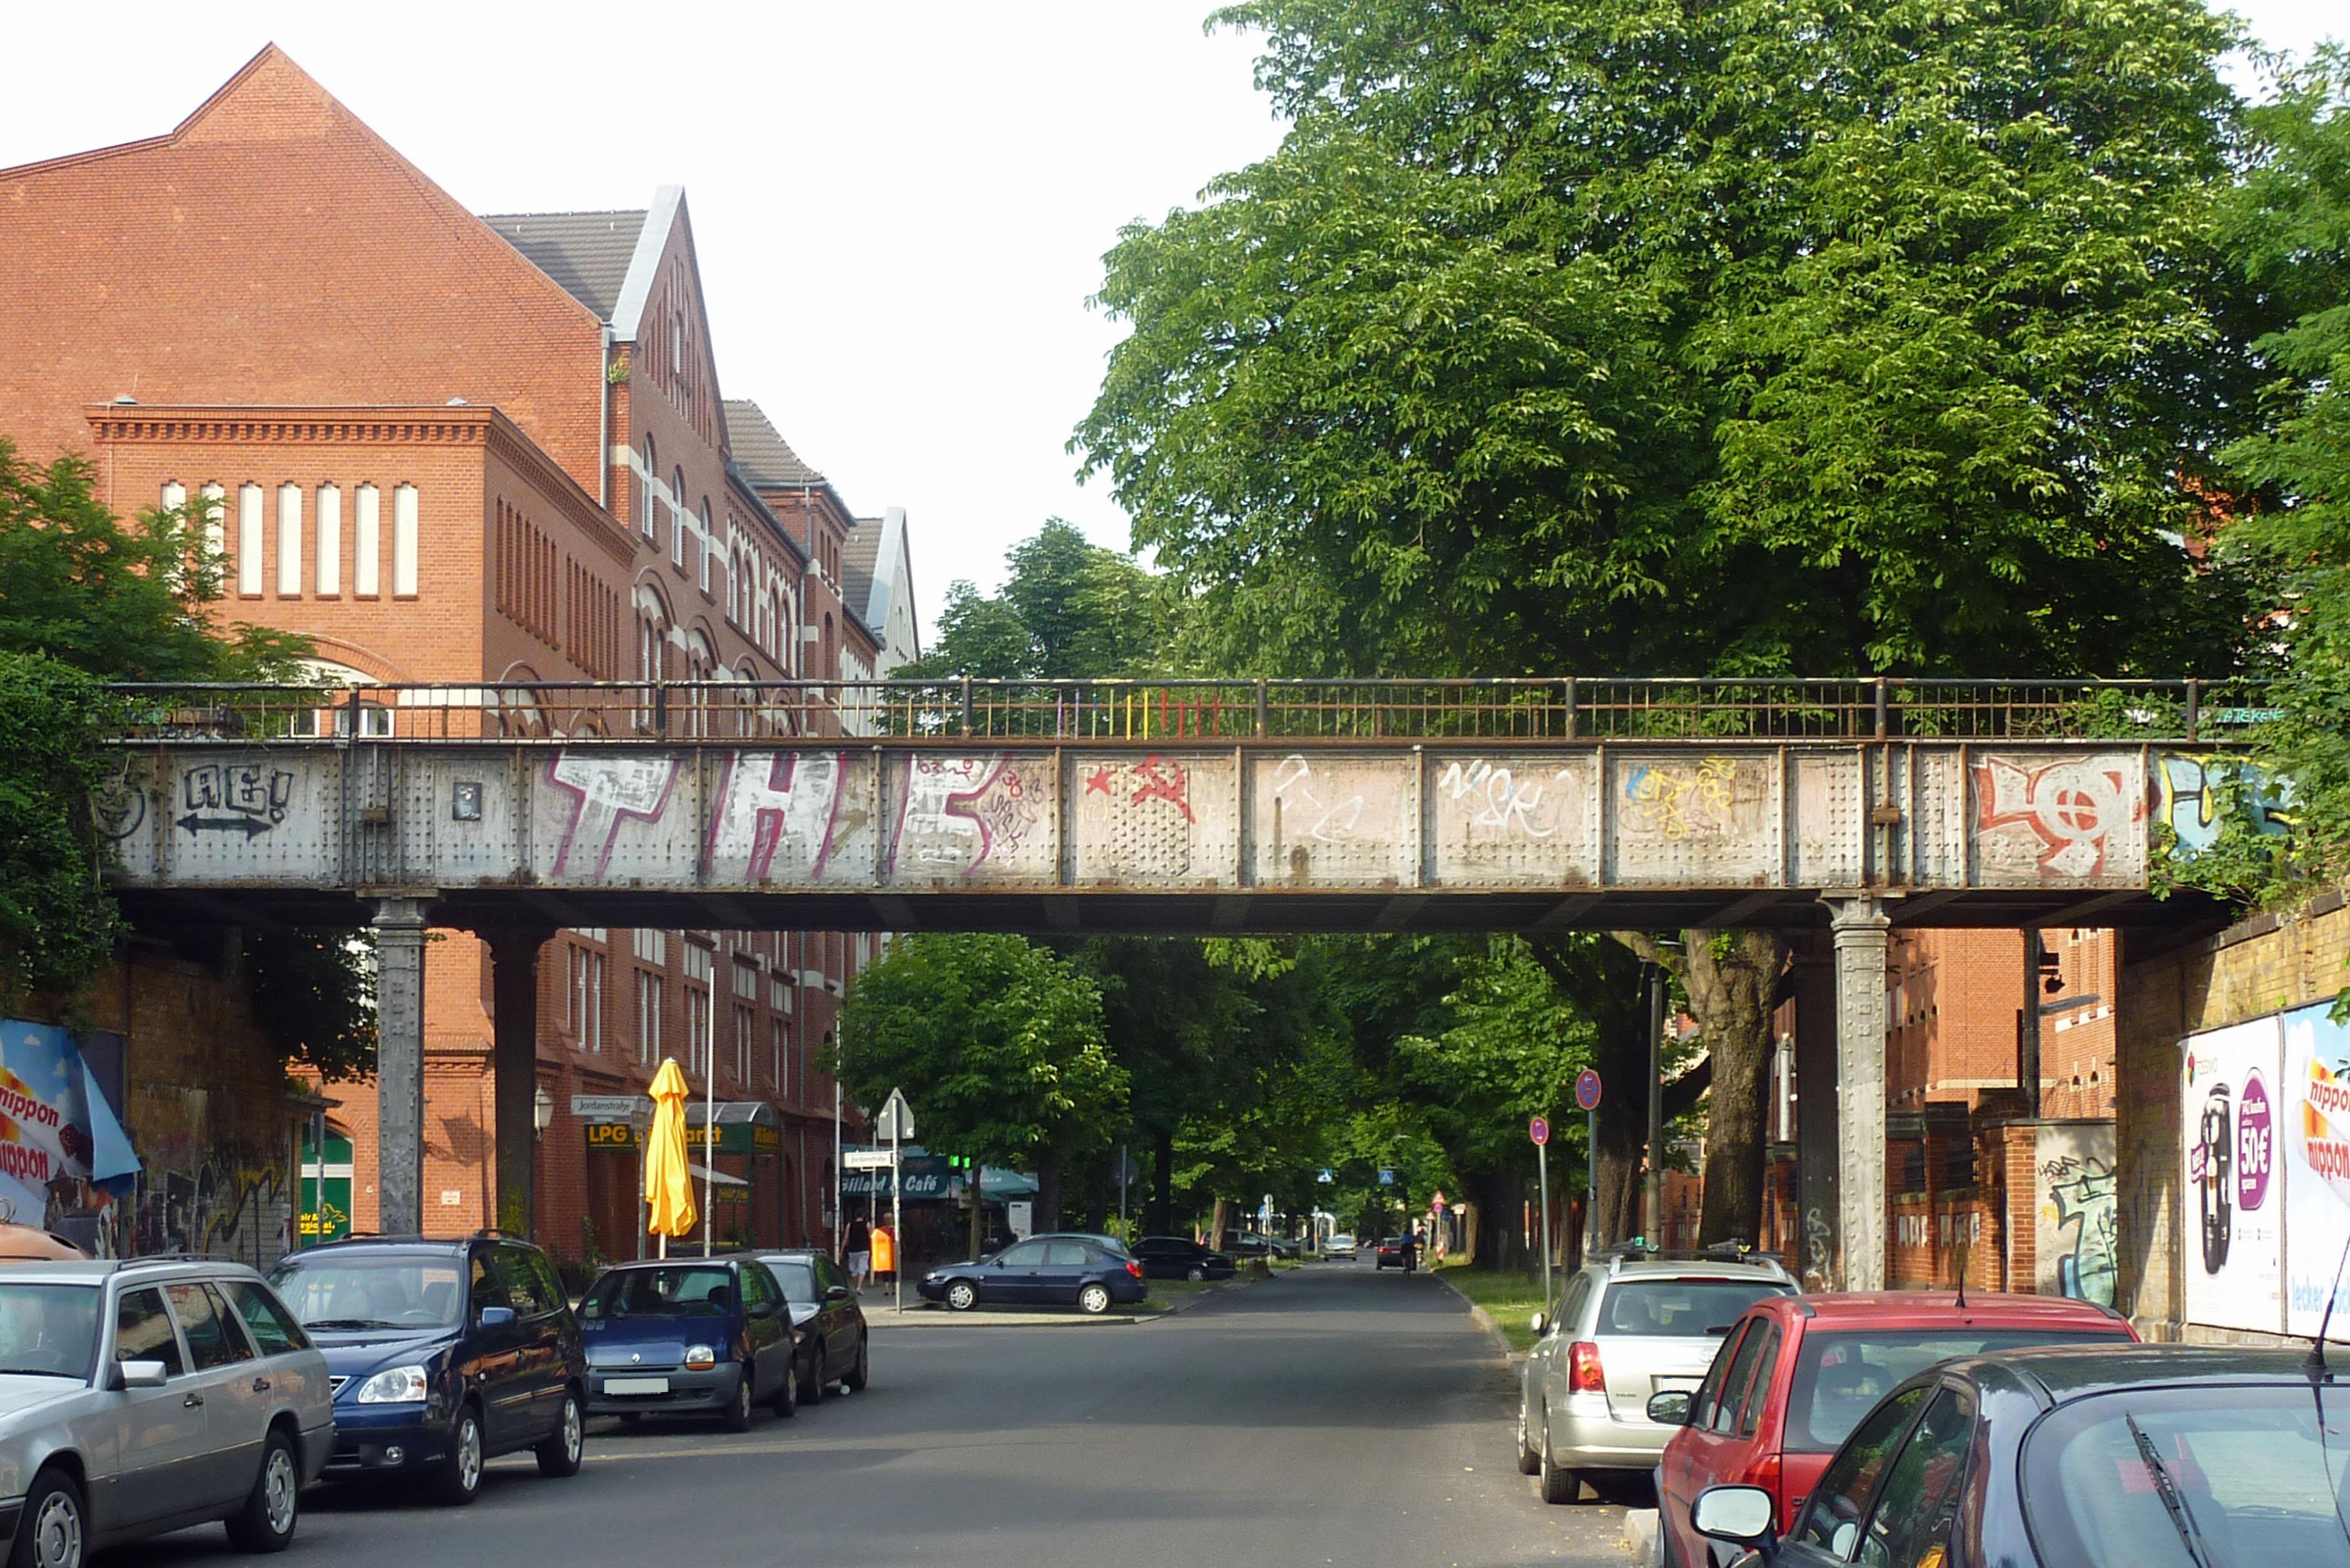 liste der kulturdenkmale in berlin alt treptow wikiwand. Black Bedroom Furniture Sets. Home Design Ideas